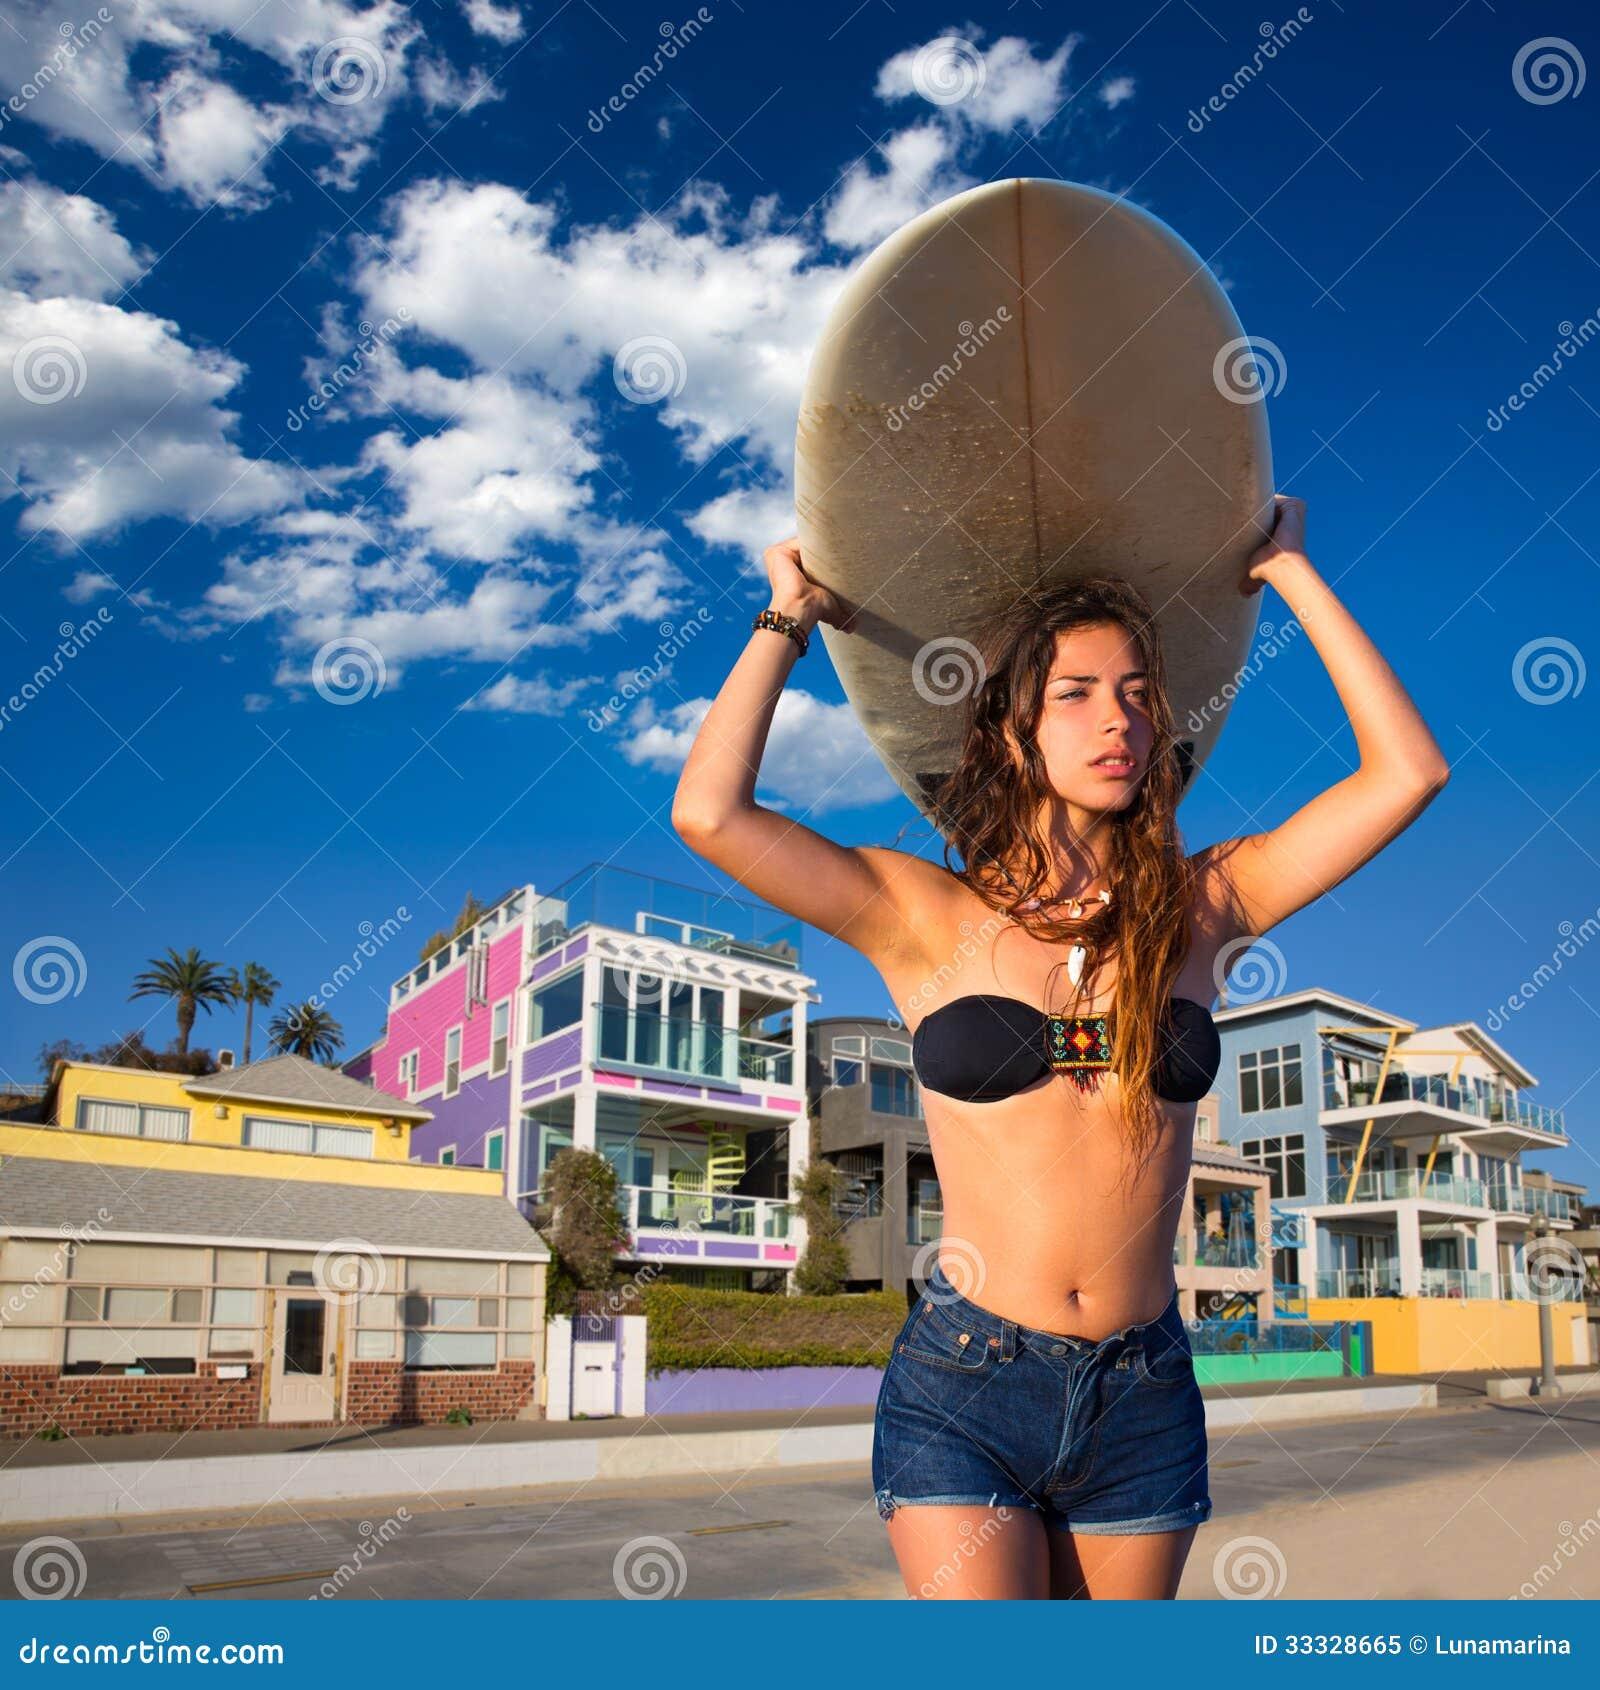 Brunette surfer teen girl holding surfboard in a beach